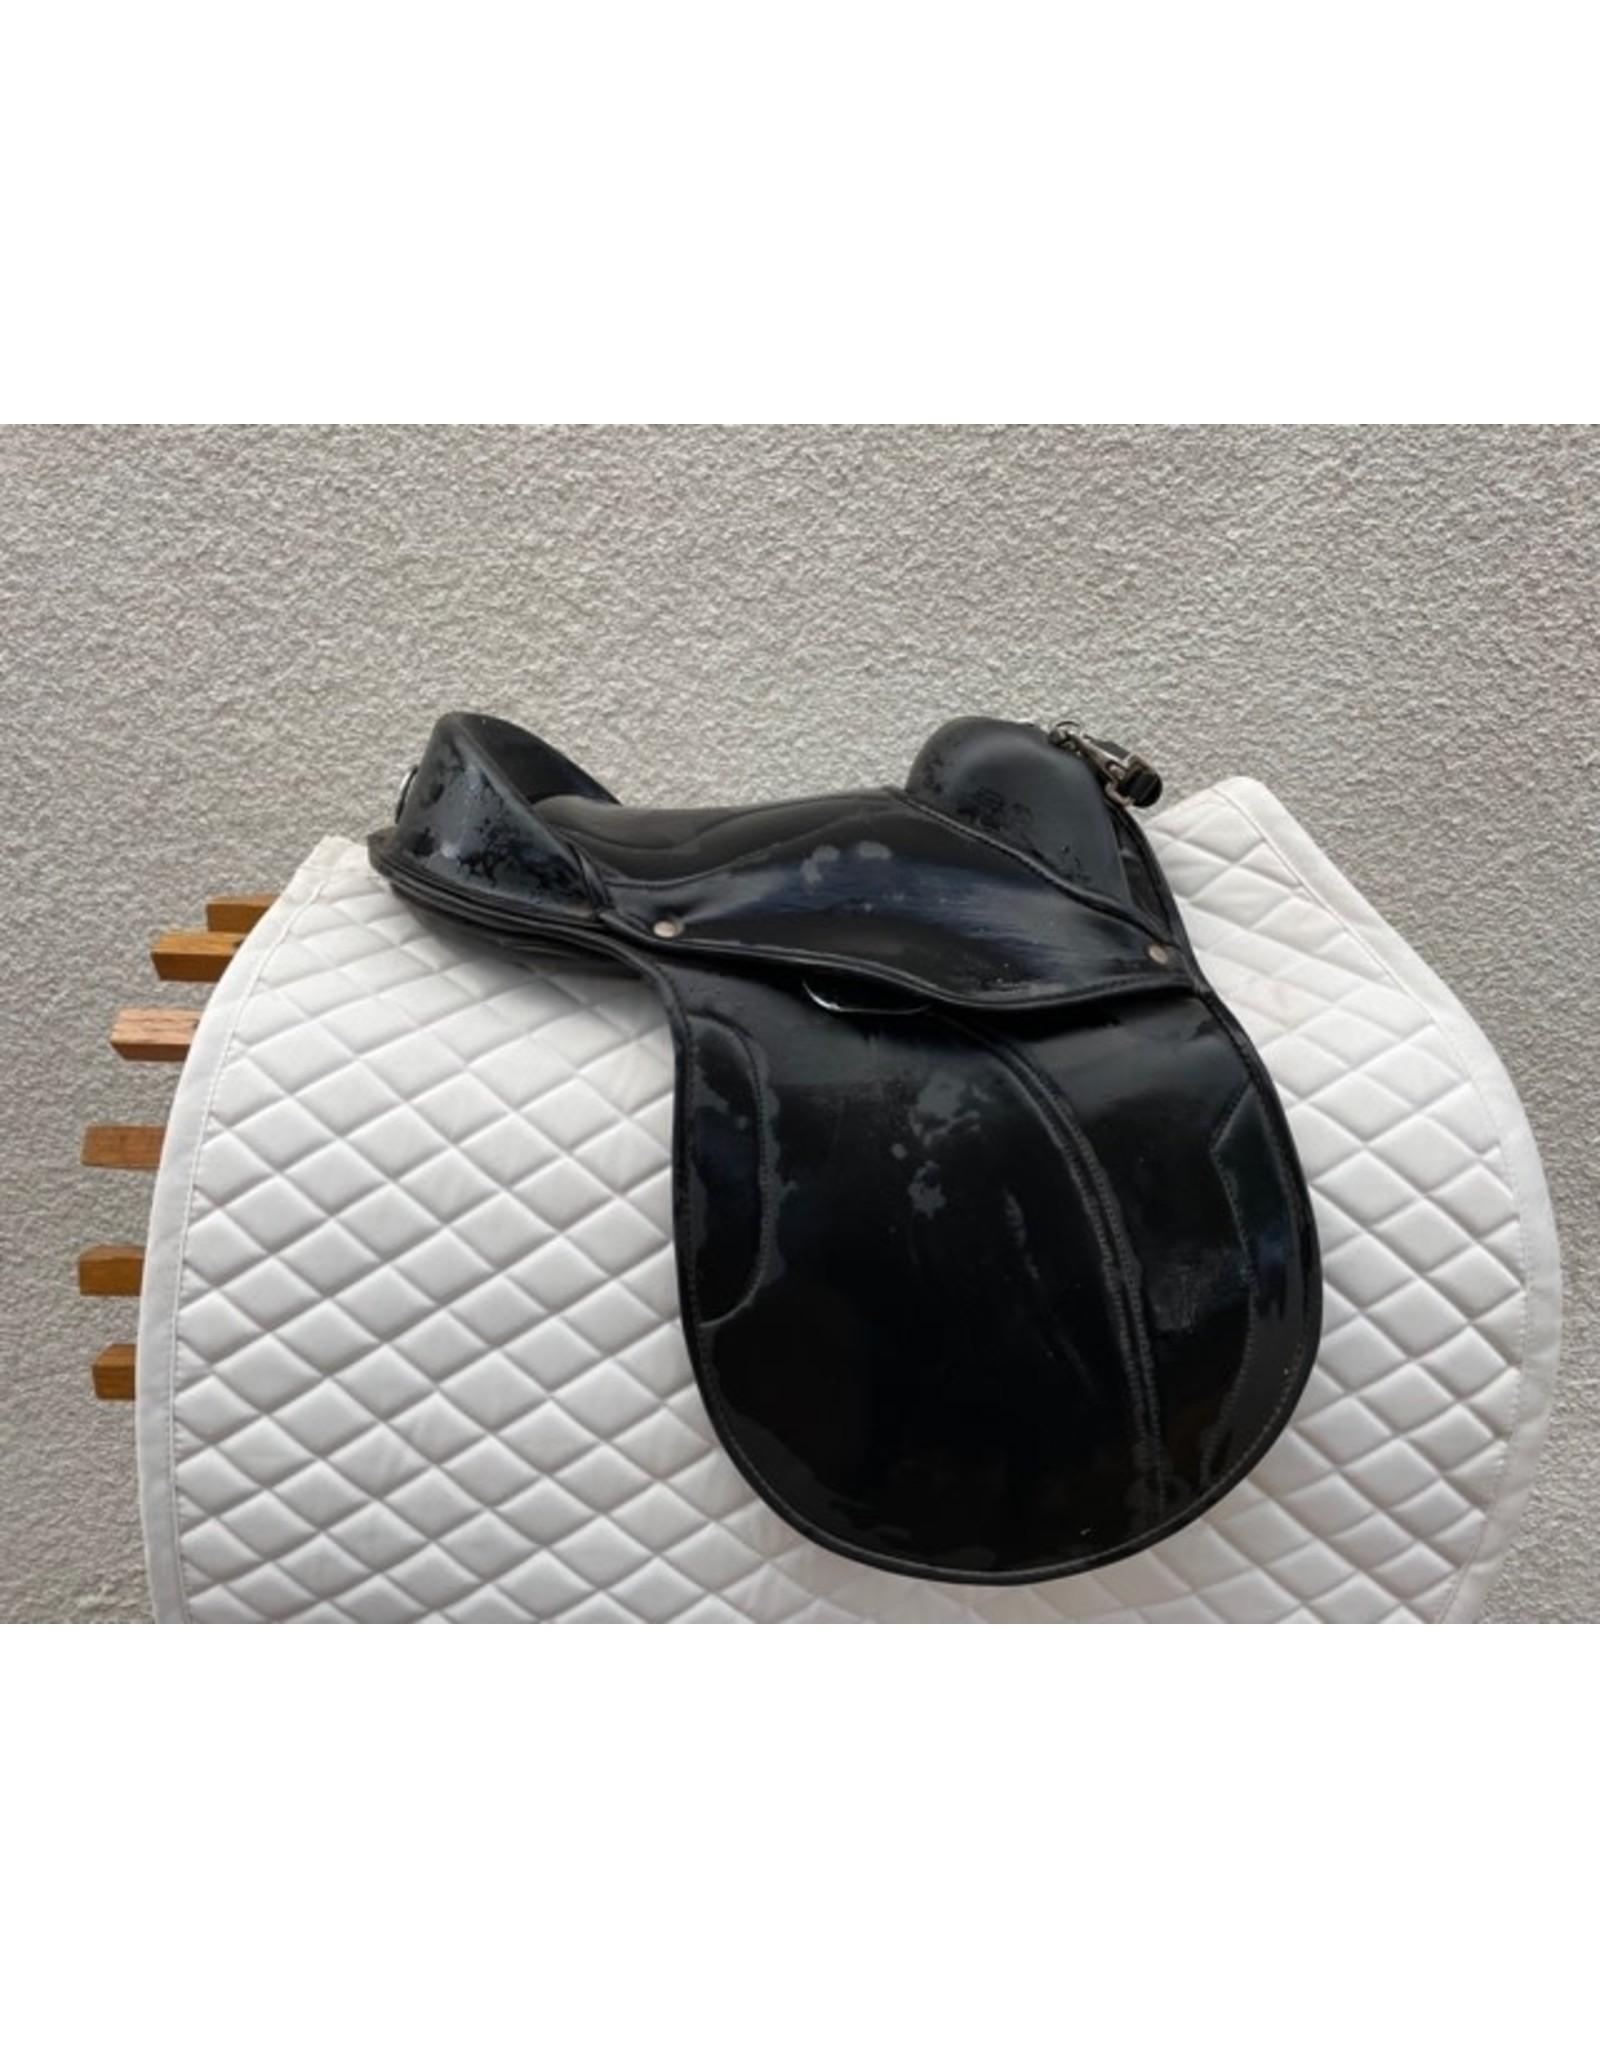 Children's Leadline saddle